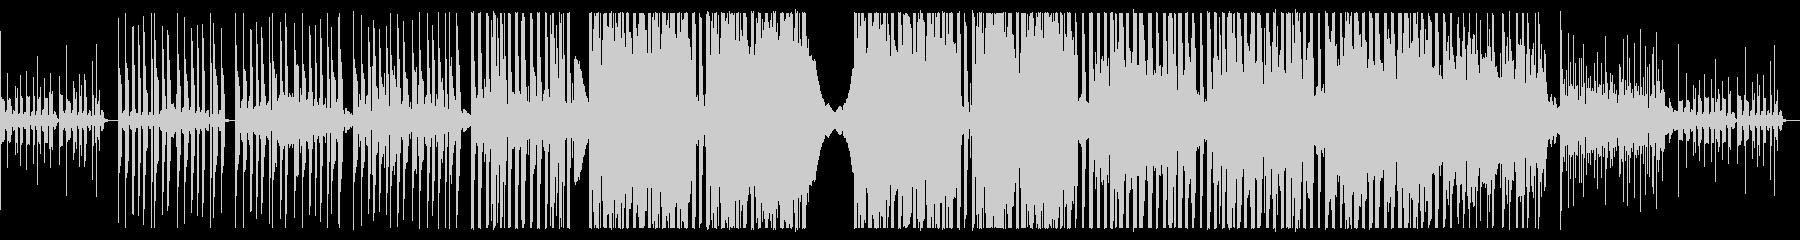 KANT_無機質BGM200601の未再生の波形